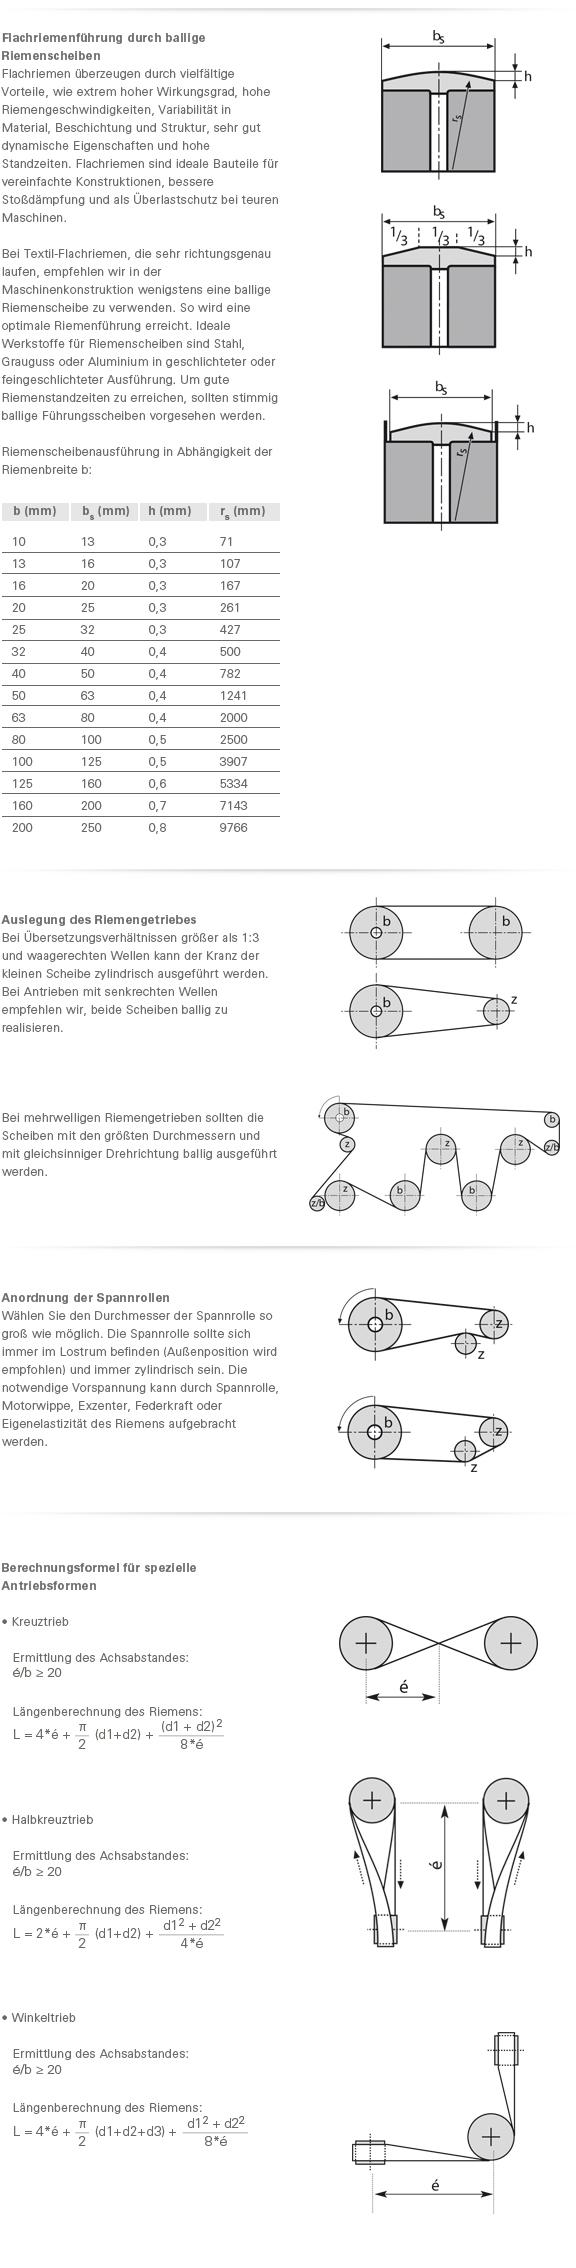 Technische Daten für Konstrukteure